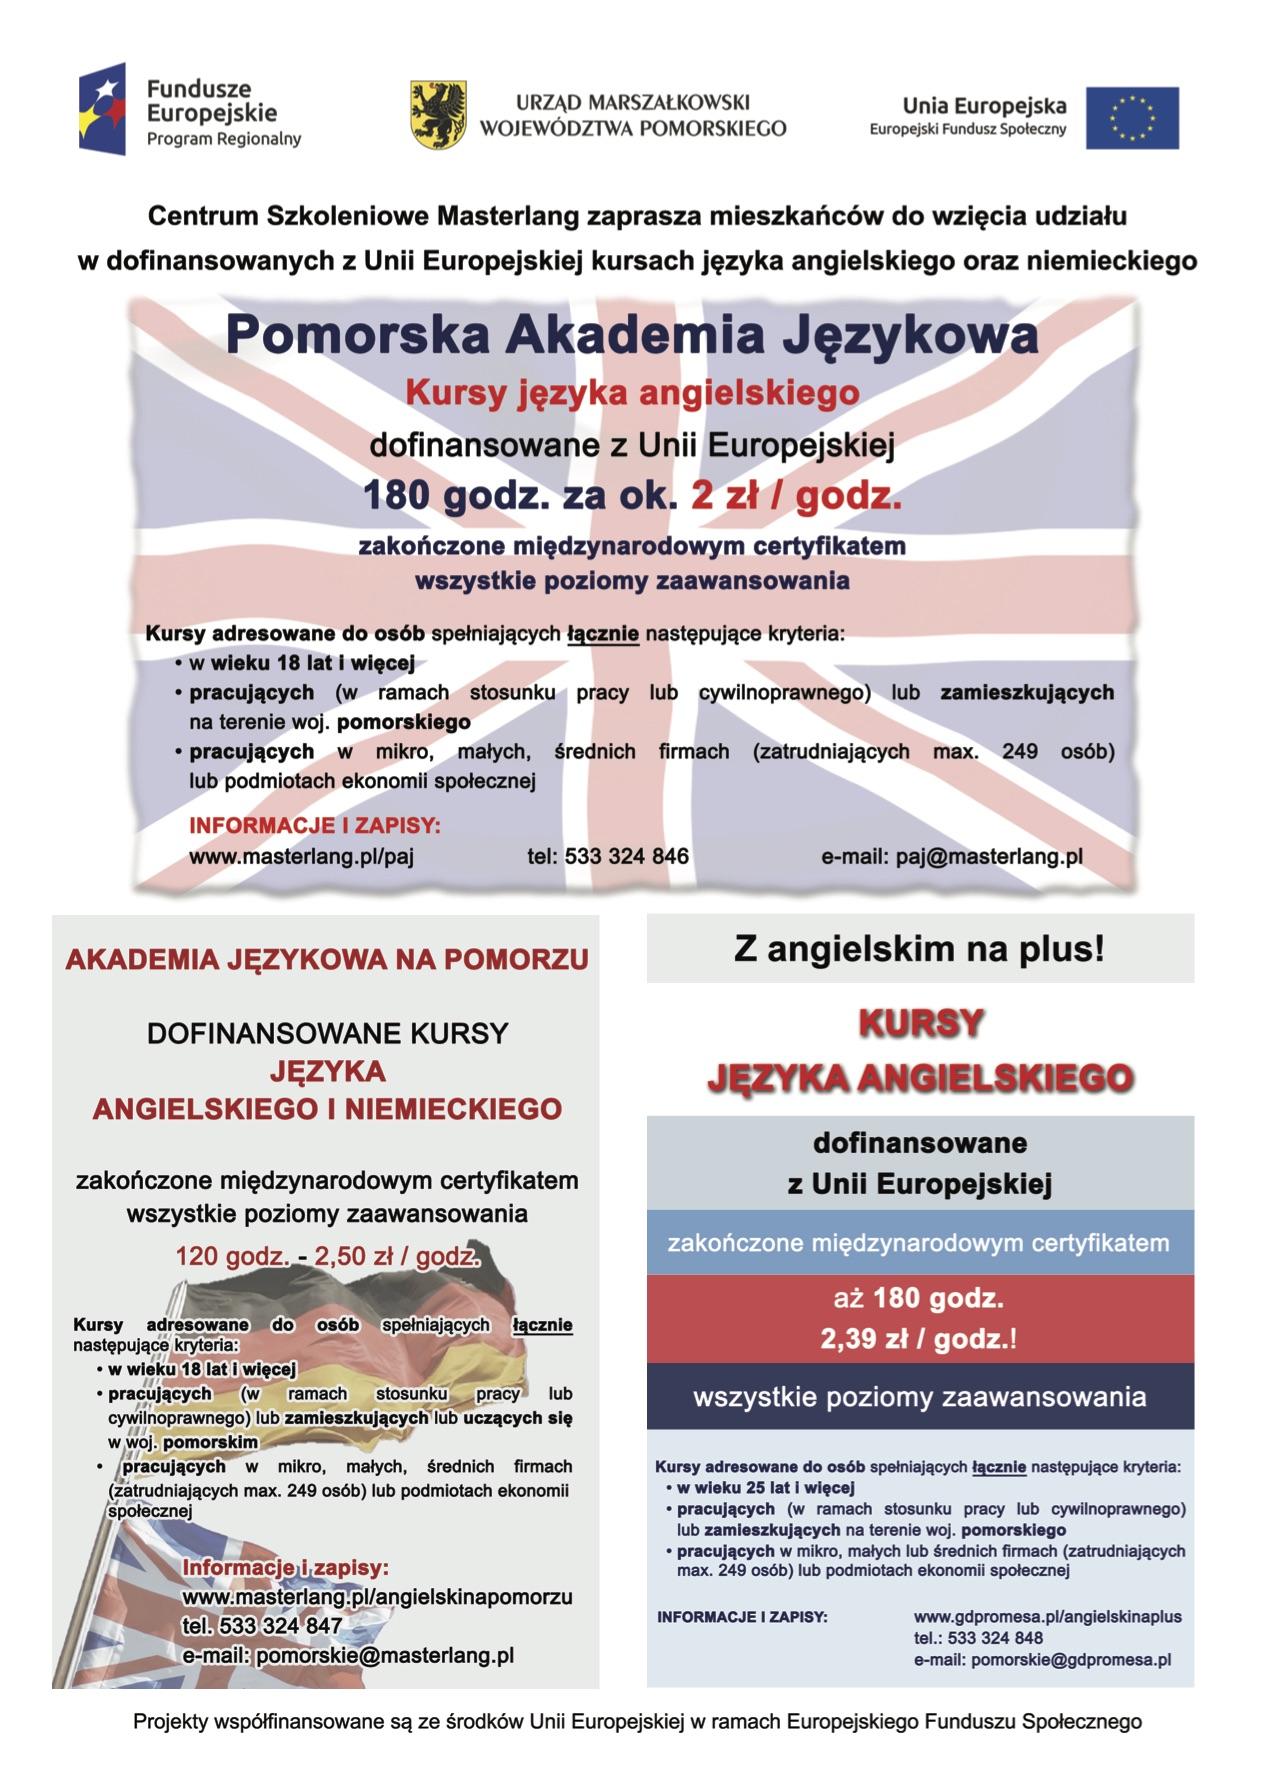 http://m.82-200.pl/2018/02/orig/plakat-kursy-jezykowe-2458.jpg